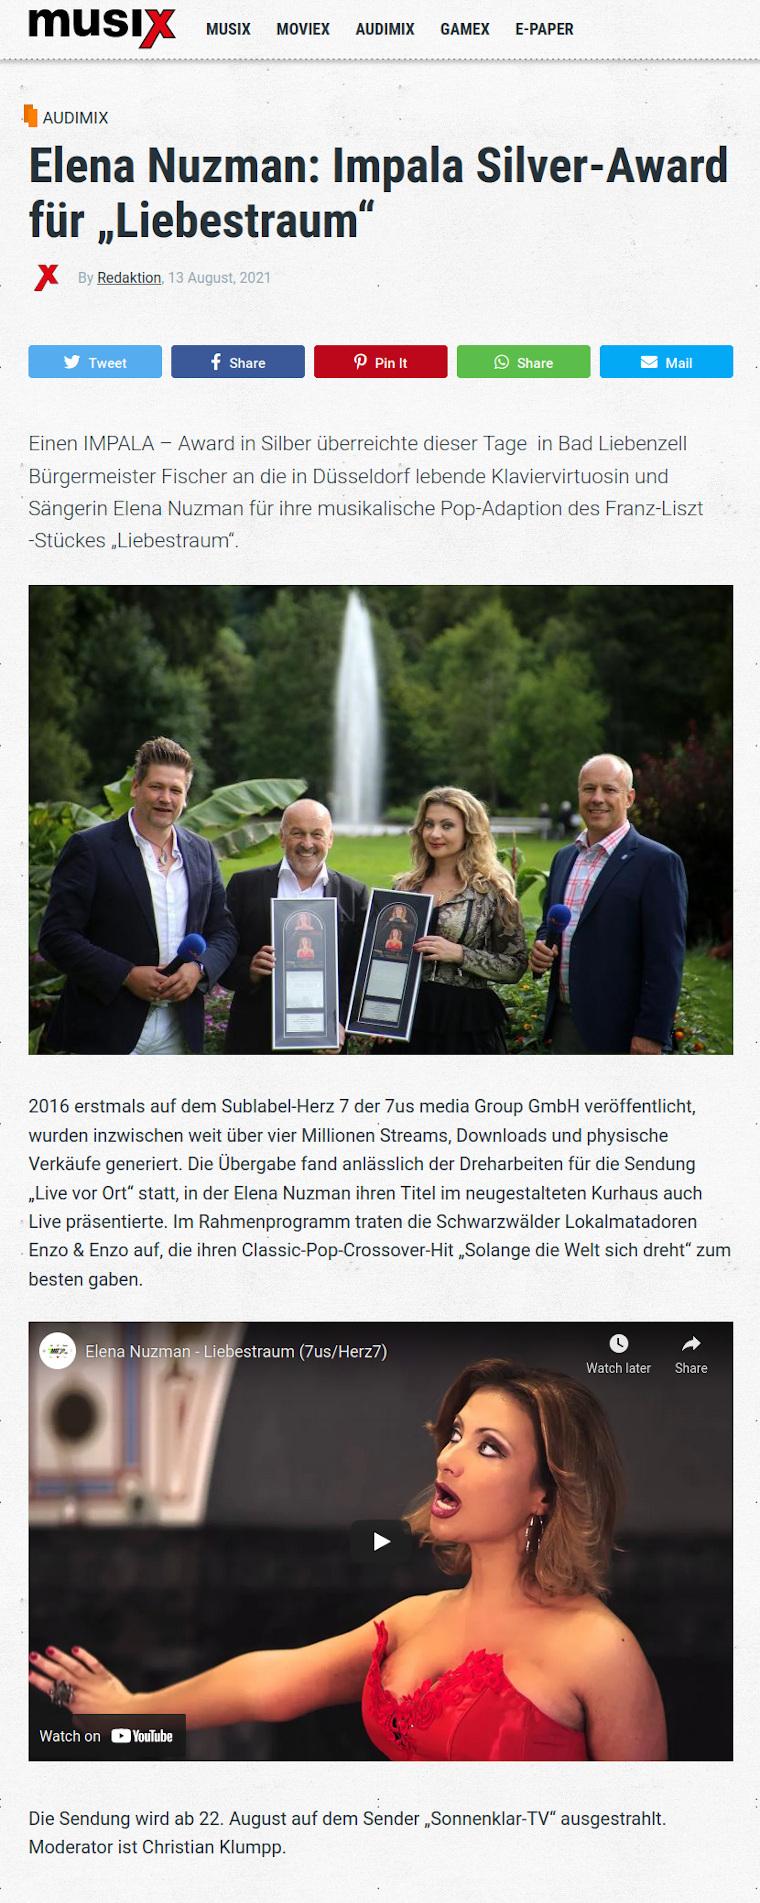 Elena Nuzman - News - Musix.de - IMPALA Silver-Award - August 2021